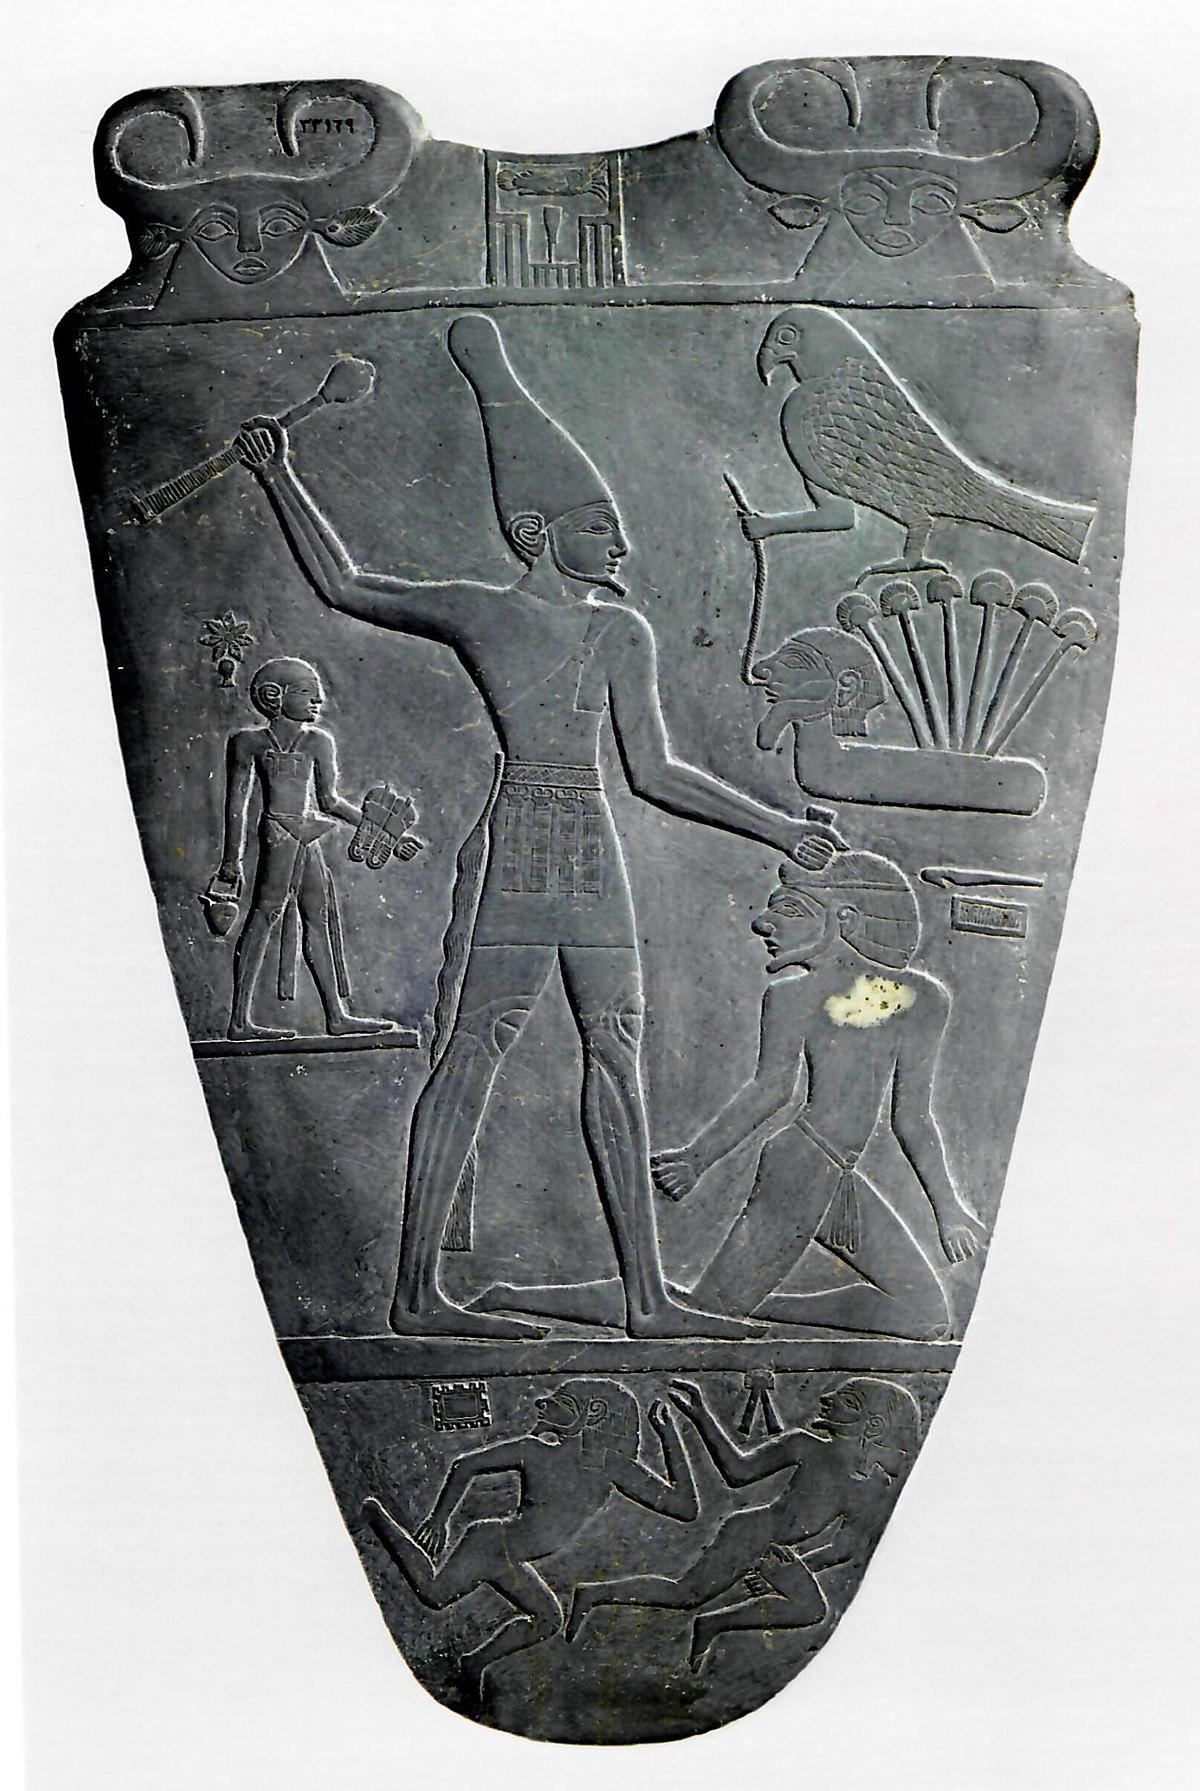 Tableau Make Pie Chart Bigger : tableau, chart, bigger, Narmer, Wikipedia